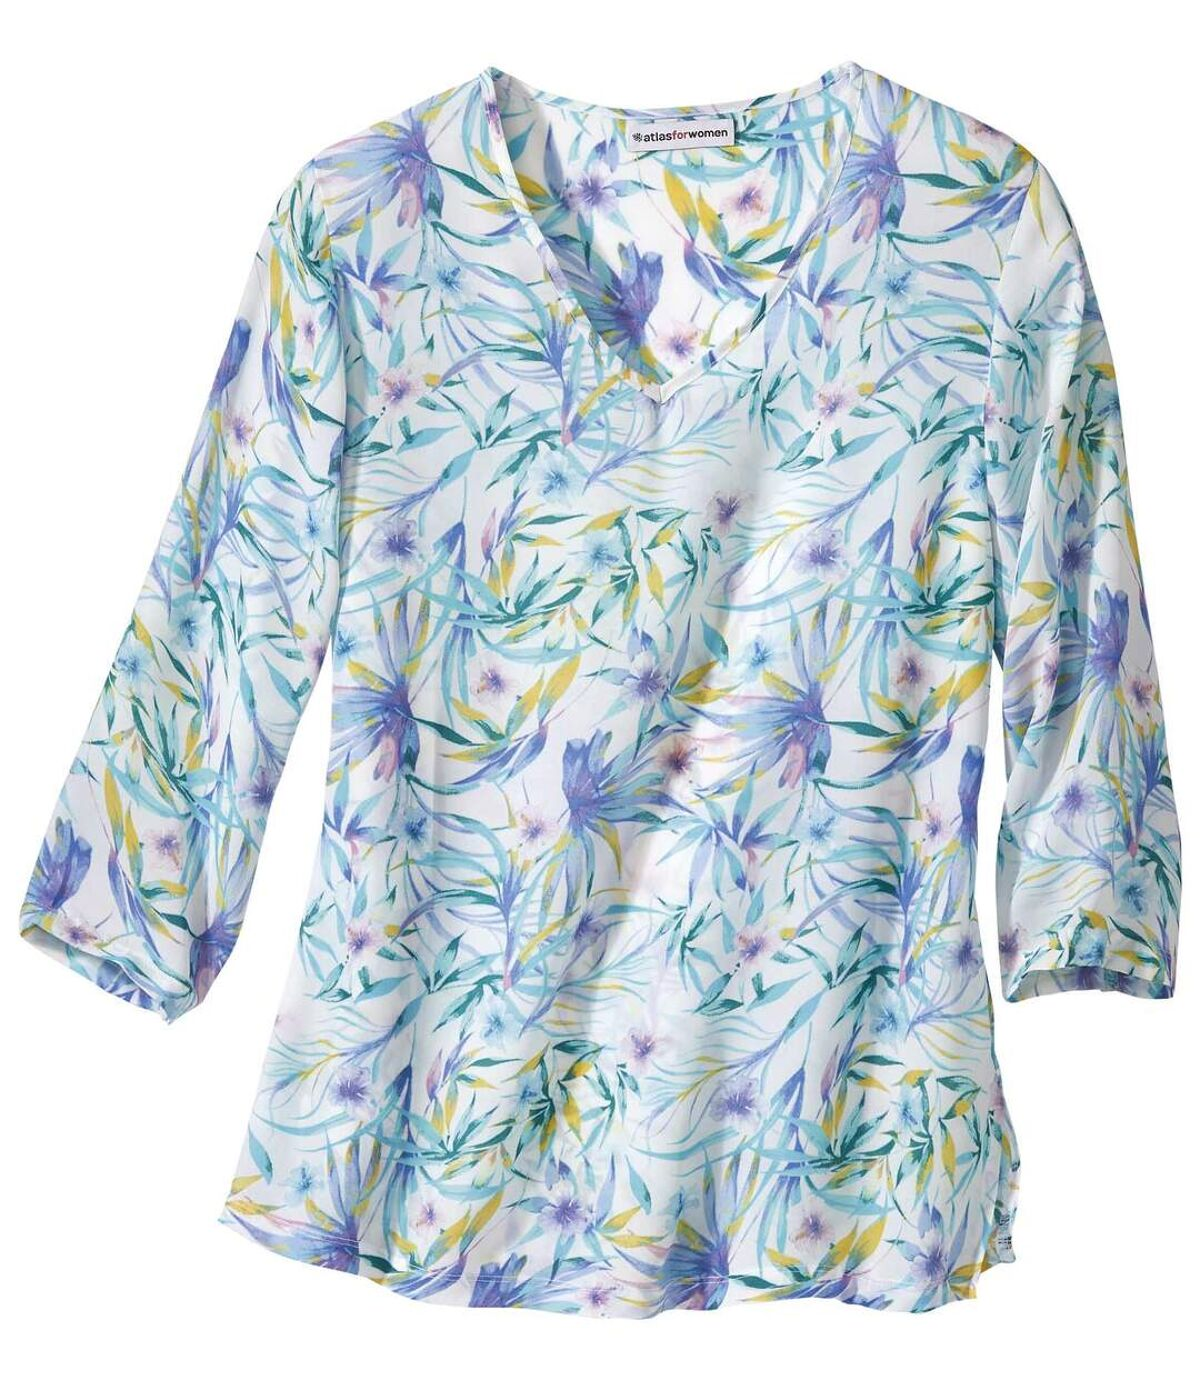 Krepp-Bluse mit Frühlings-Motiv Atlas For Men